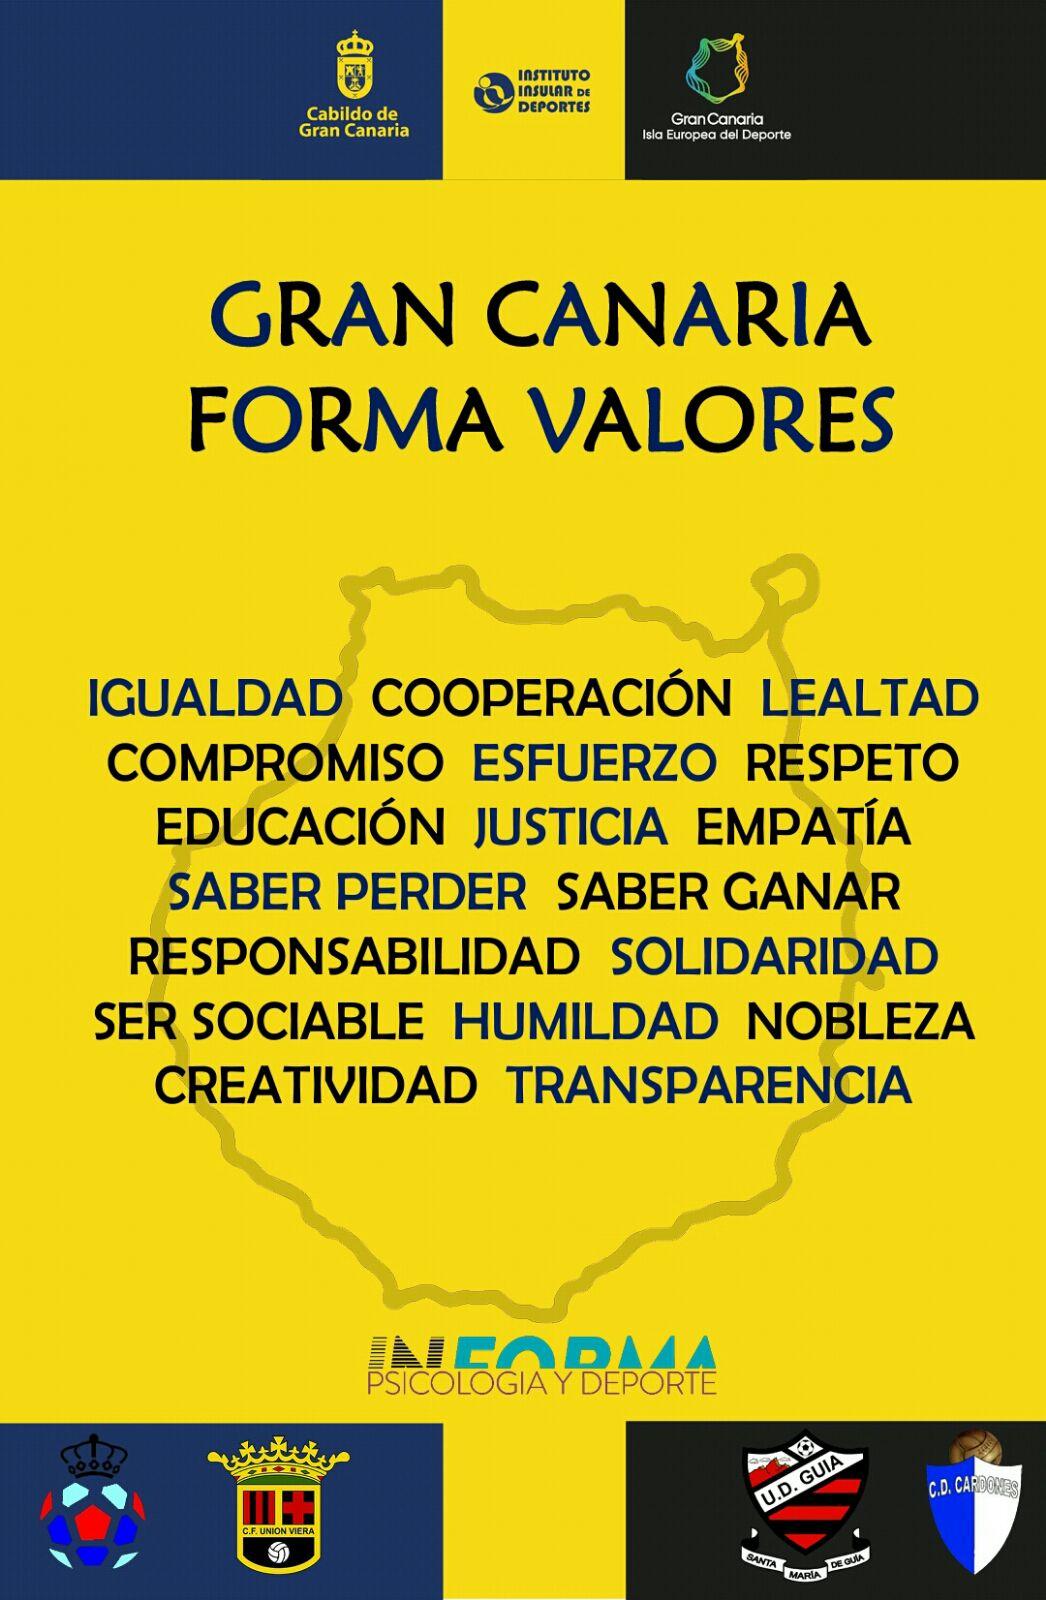 Valores creados en GRAN CANARIA FORMA VALORES 2018